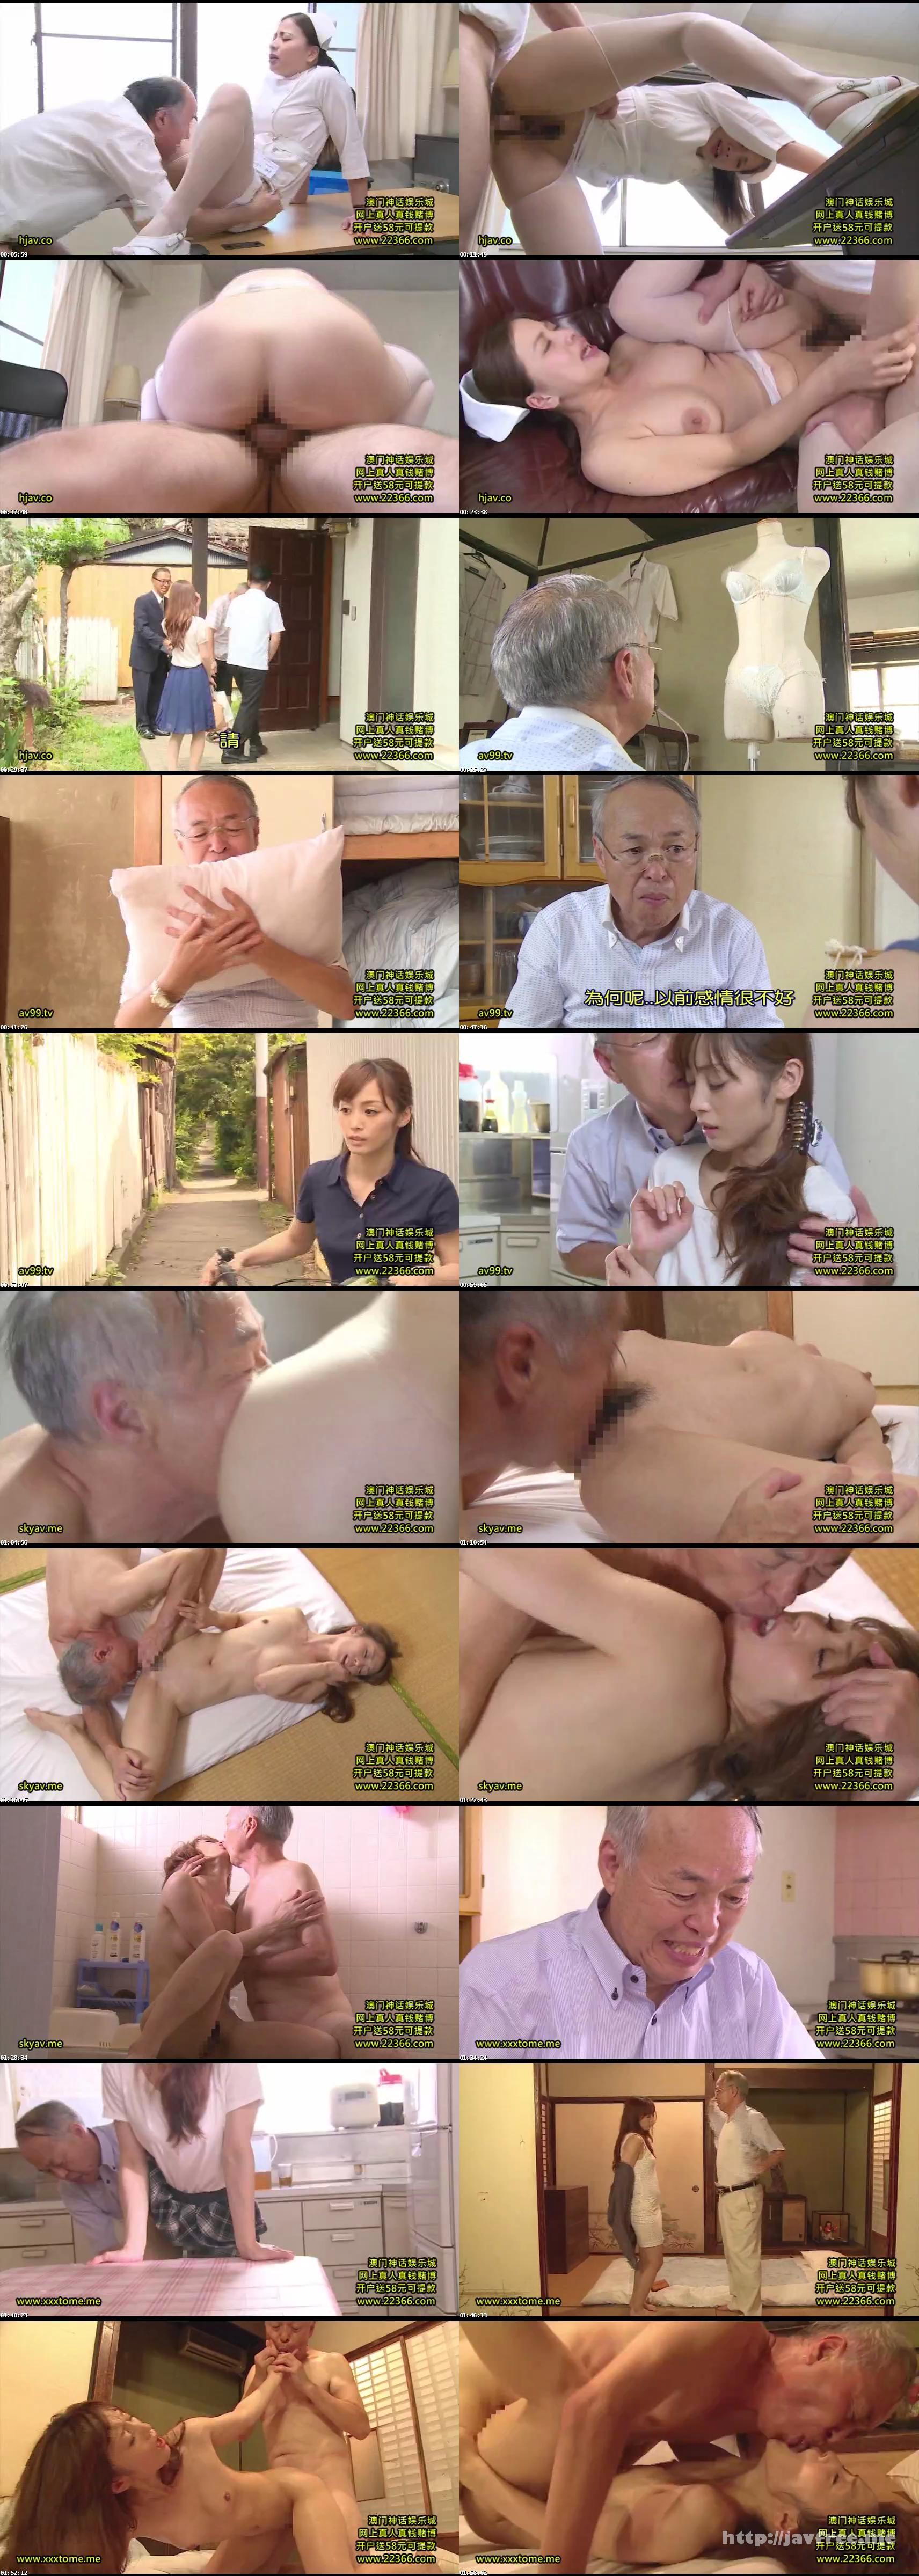 [BNSPS-391] 老人とのいやらしすぎるセックス 物凄い舐めに喚起する女たち - image BNSPS-391 on https://javfree.me